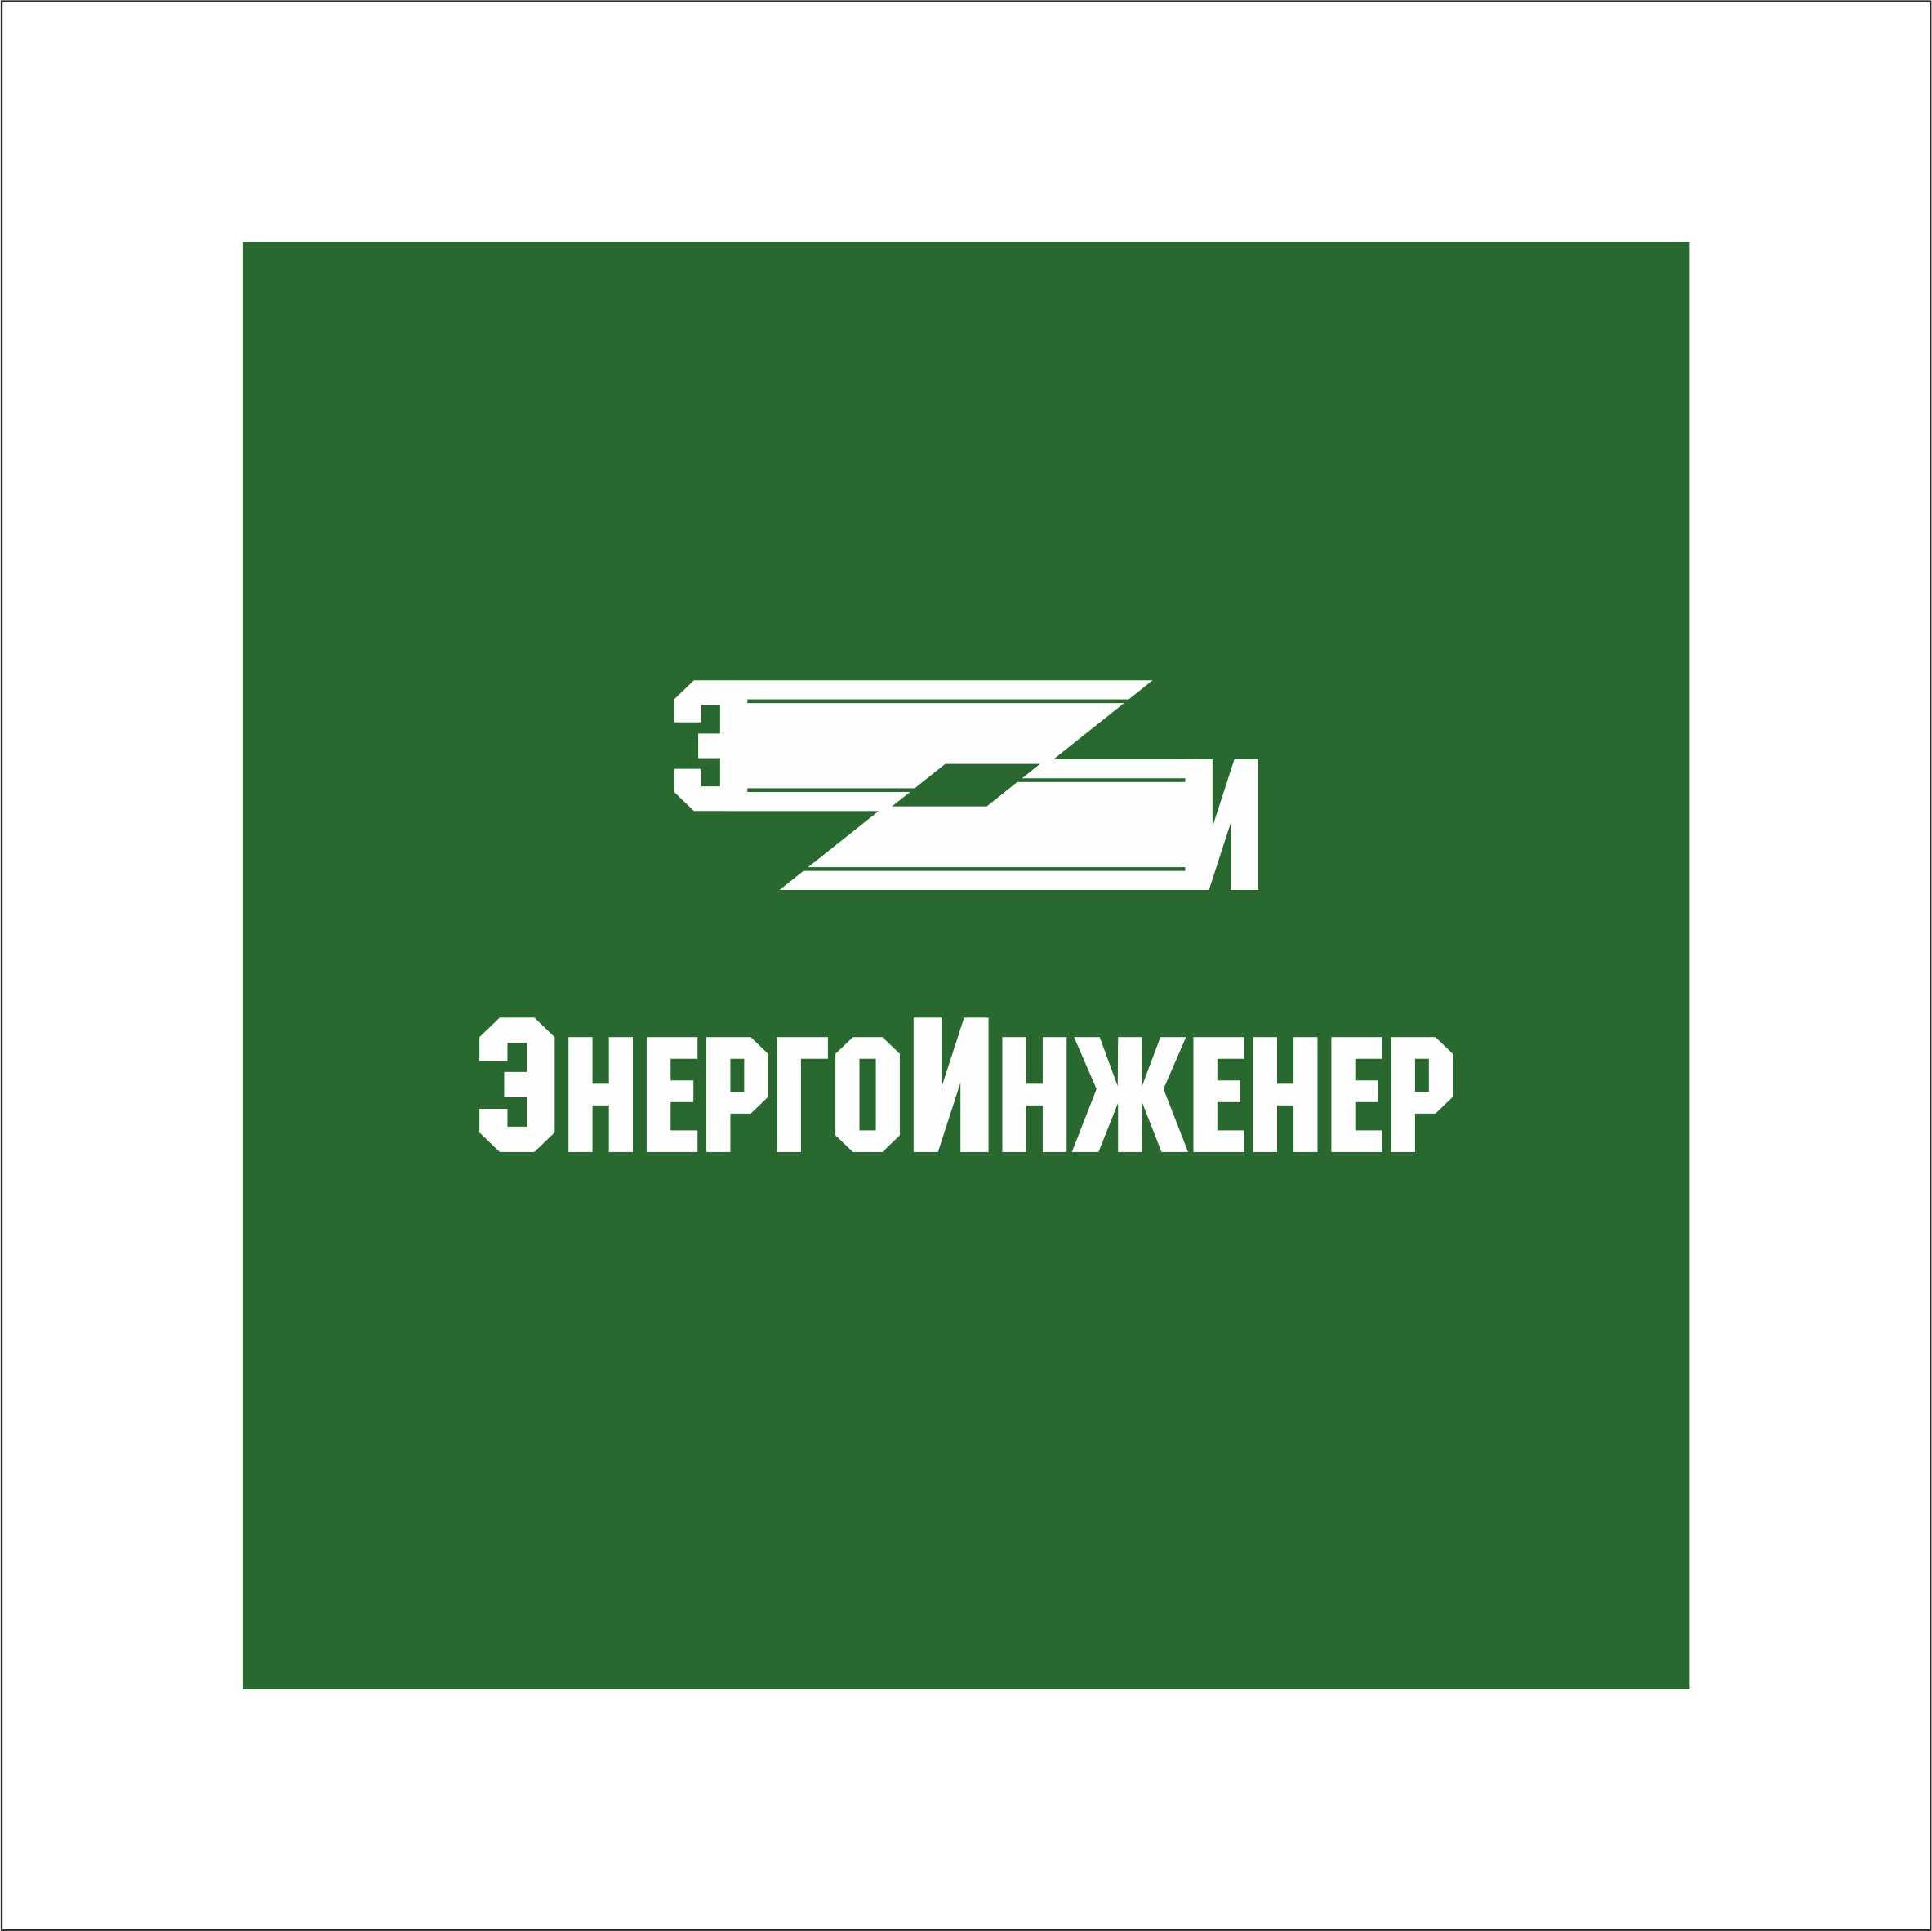 Логотип для инженерной компании фото f_40851c80aa30655e.jpg